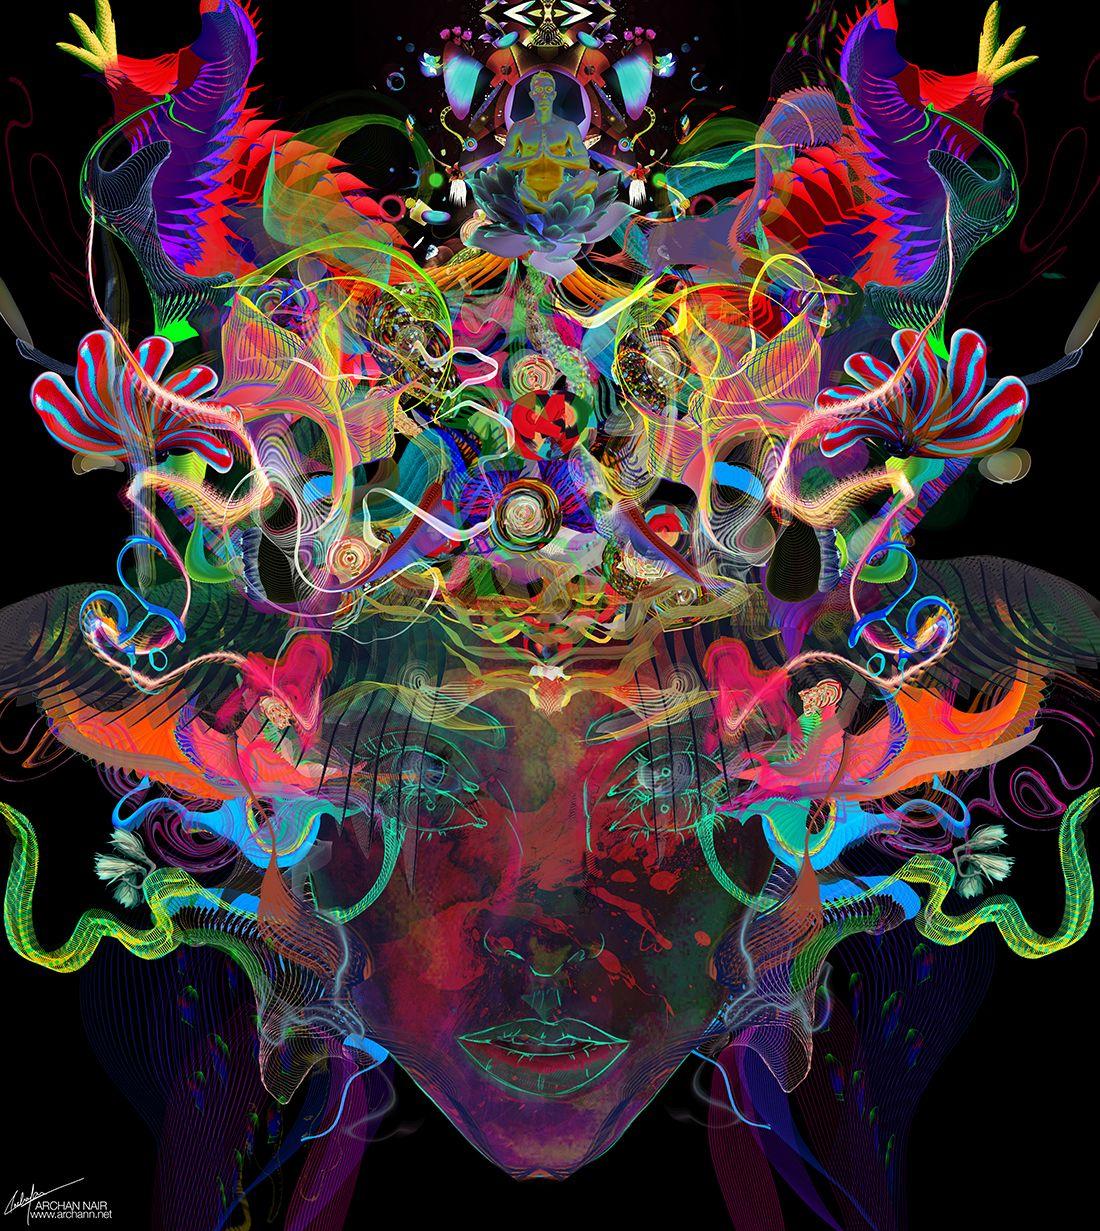 Color art facebook - Archann Archan Nair New Artwork Titled Luminance Website Facebook